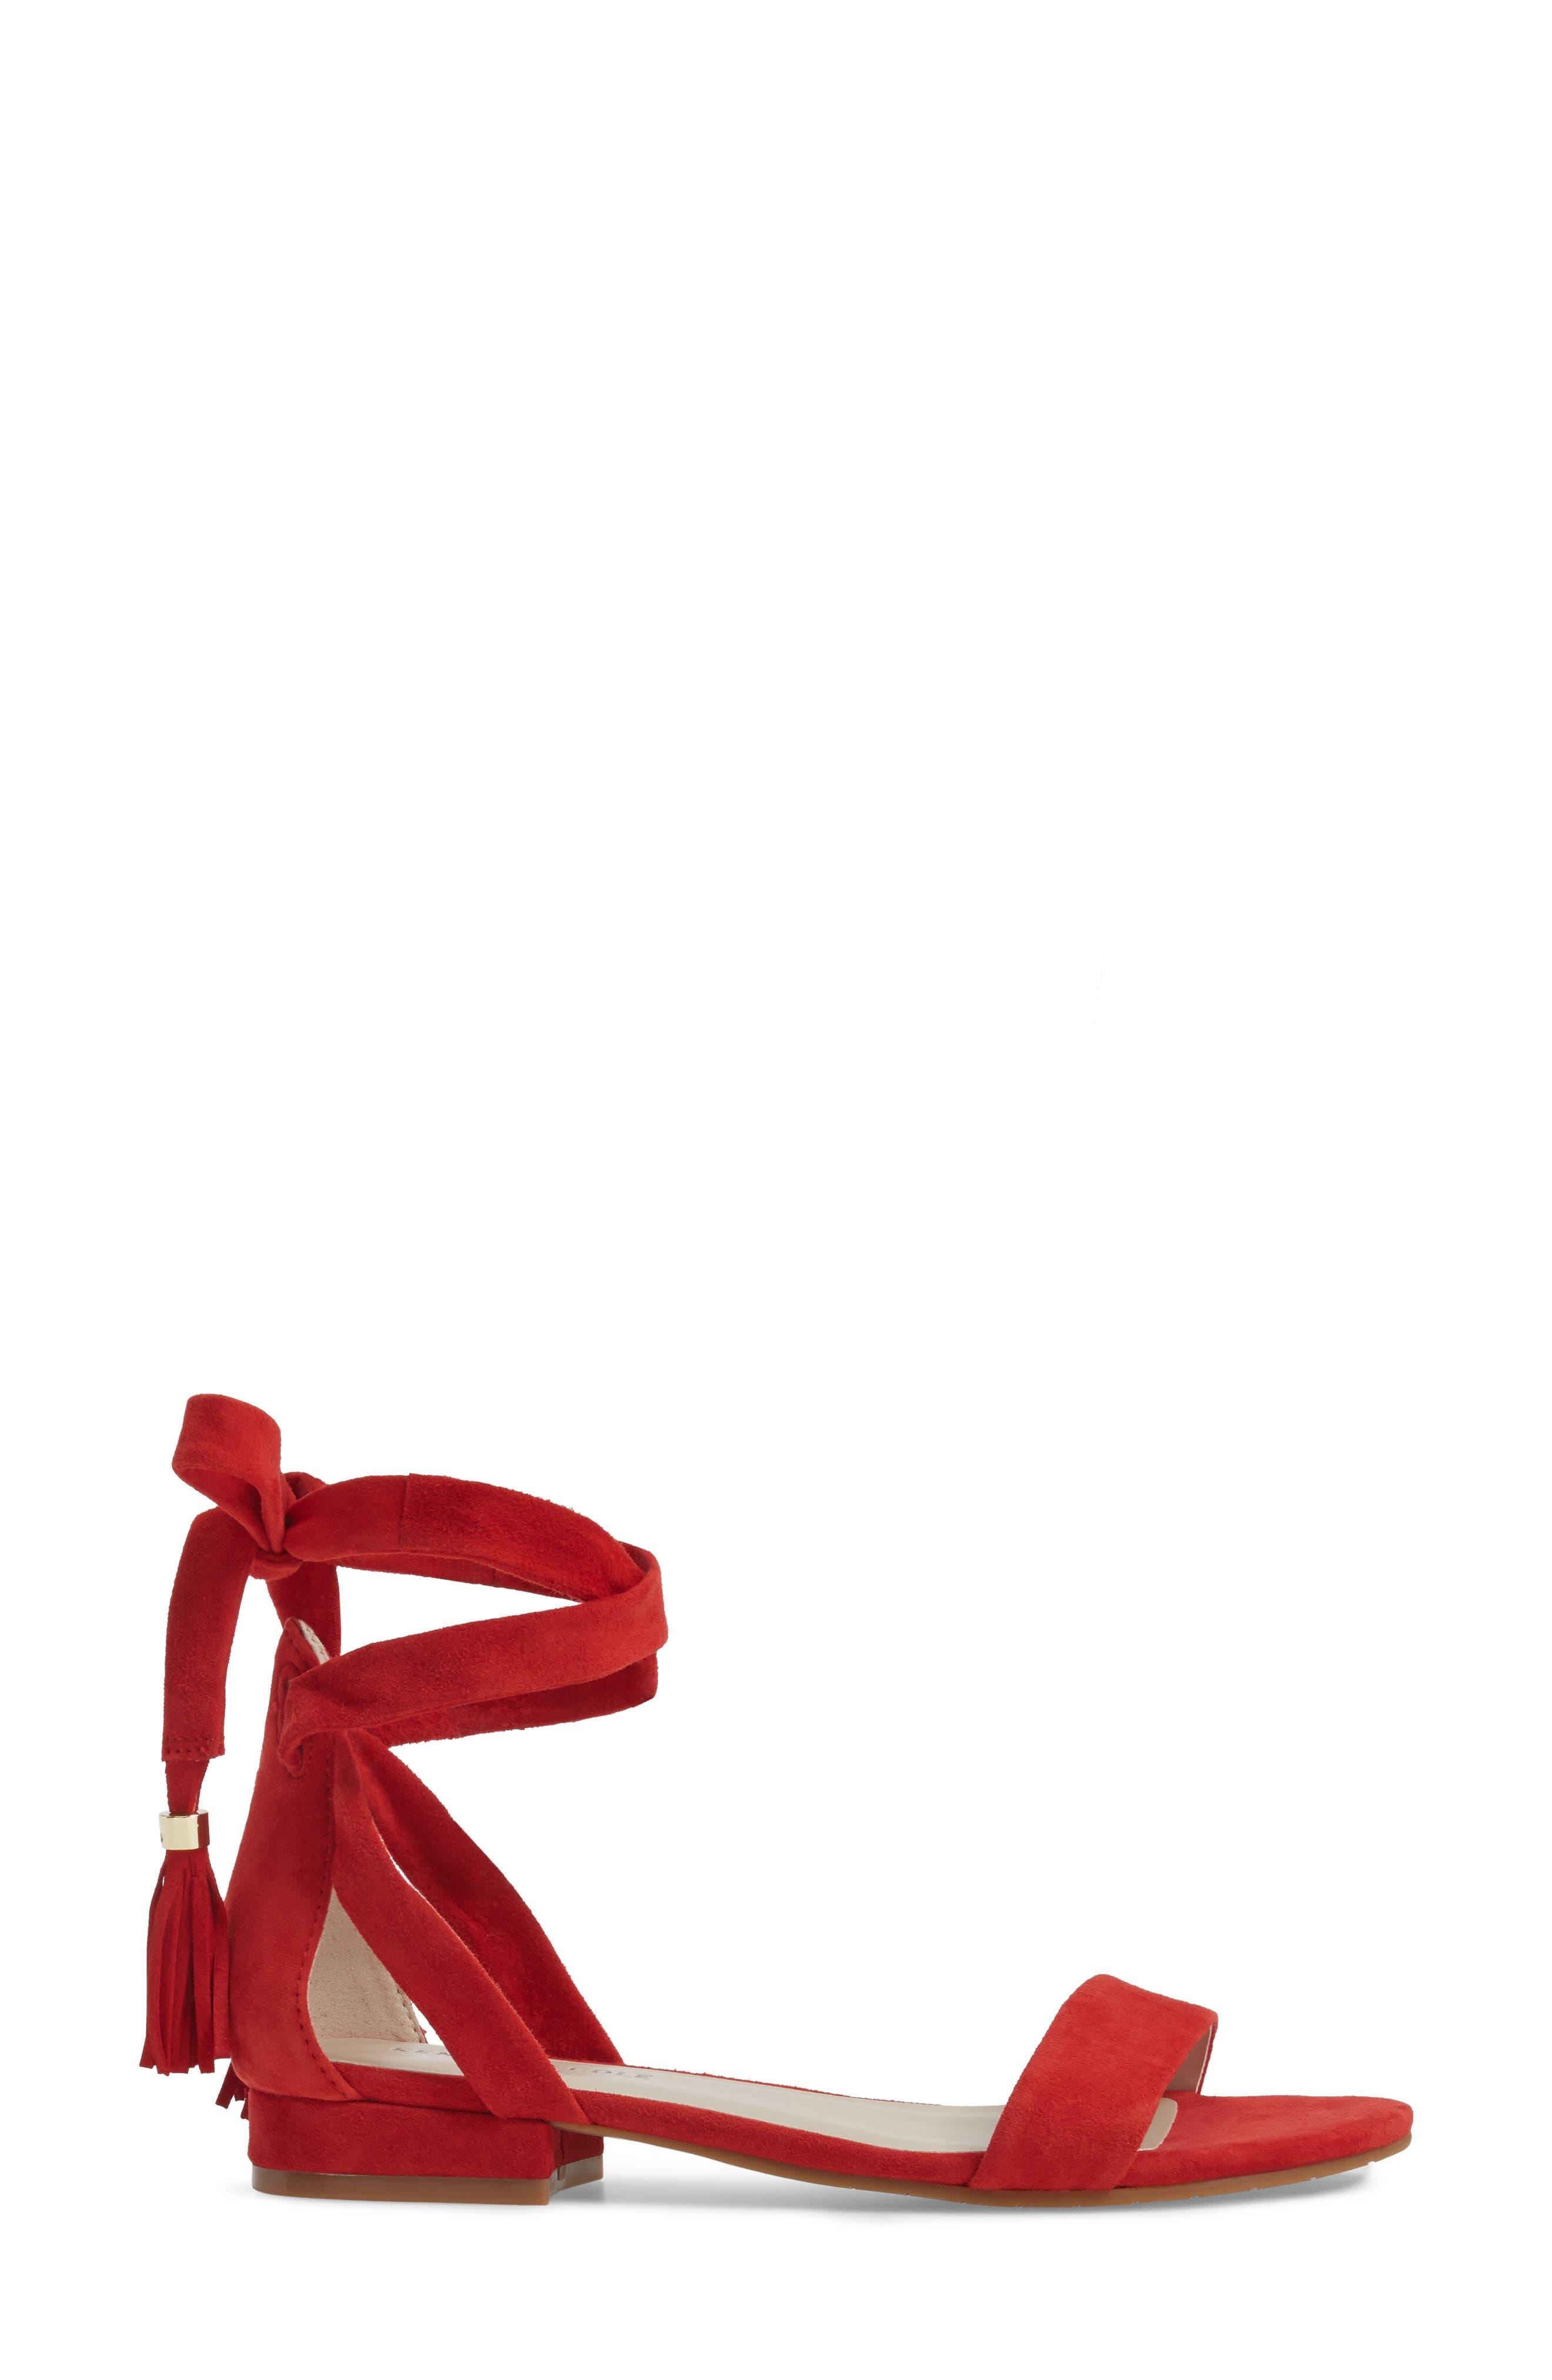 Valen Tassel Lace-Up Sandal,                             Alternate thumbnail 39, color,